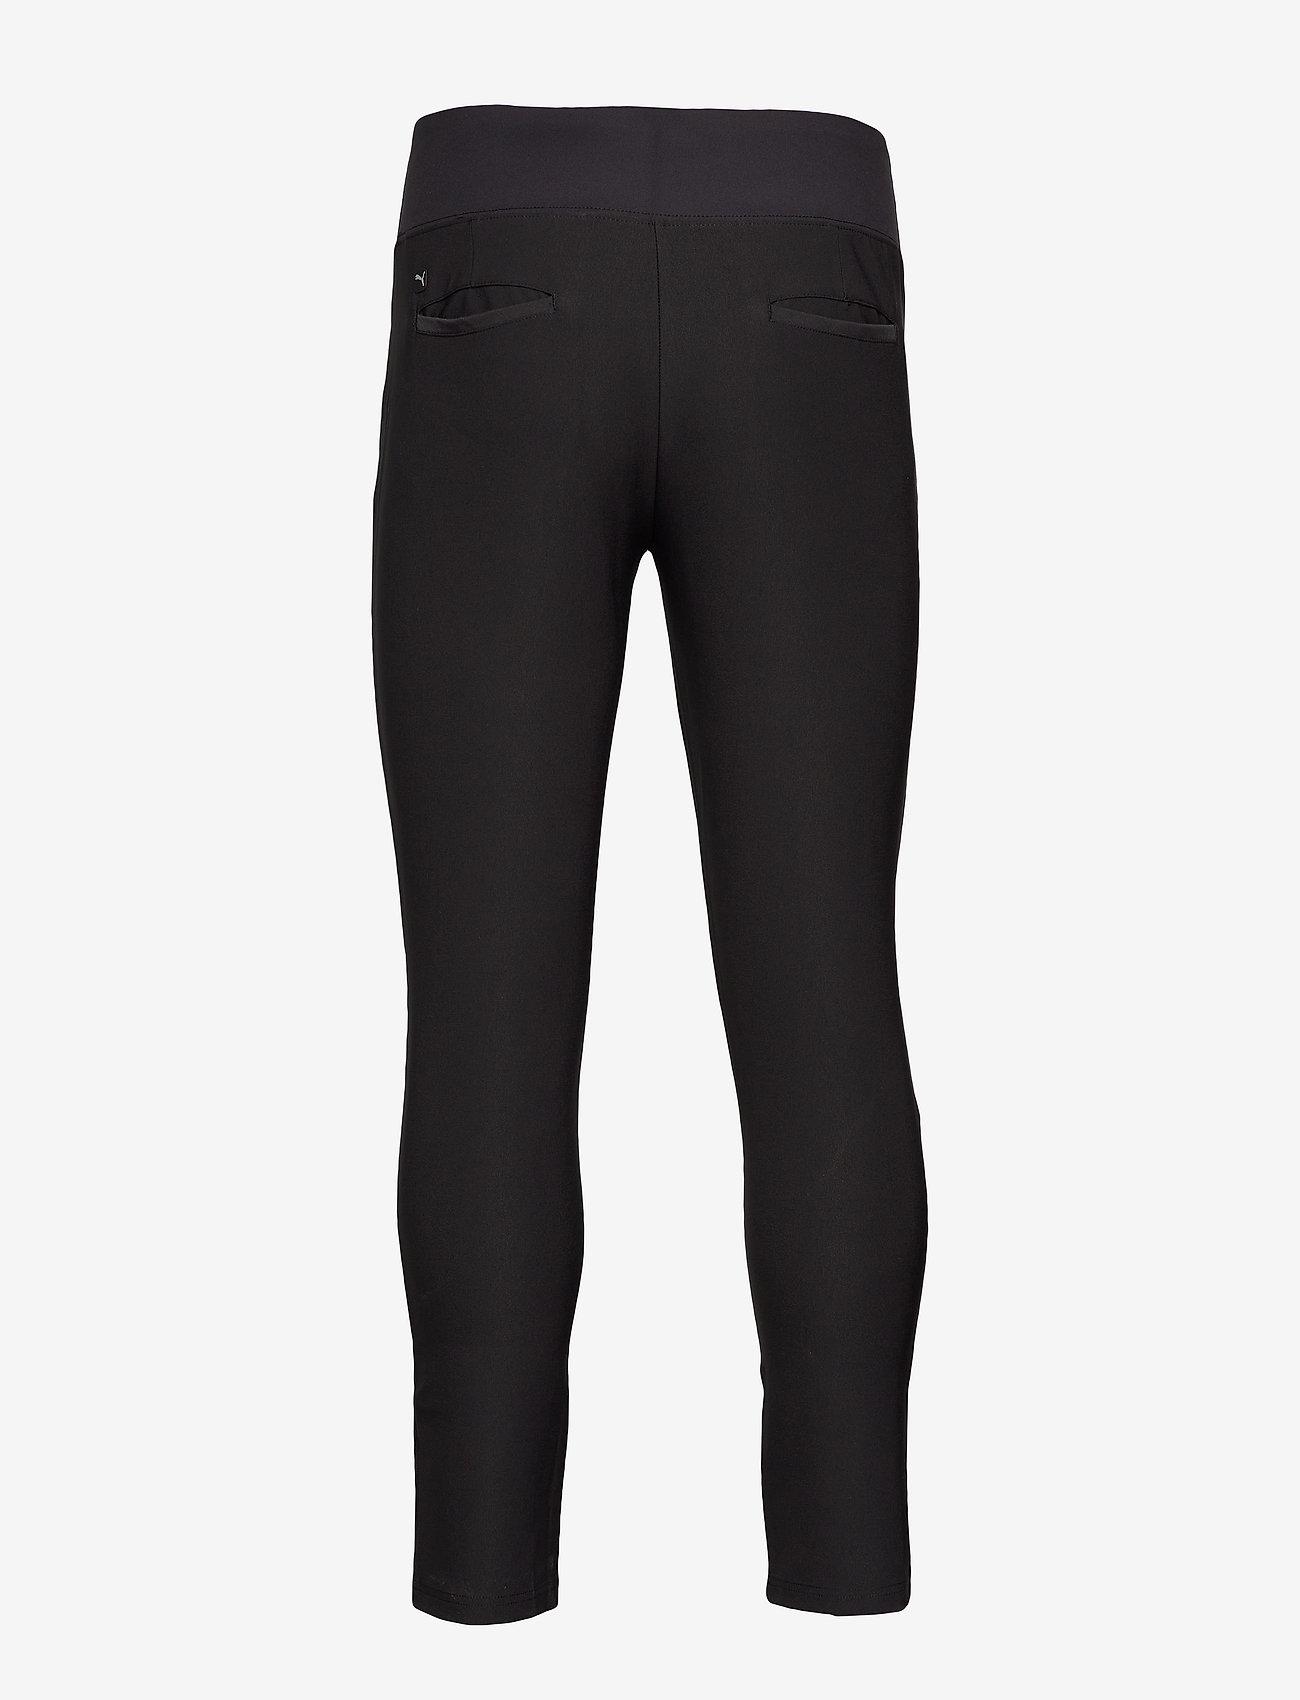 PUMA Golf - PWRSHAPE Pant - golfbroeken - puma black - 1